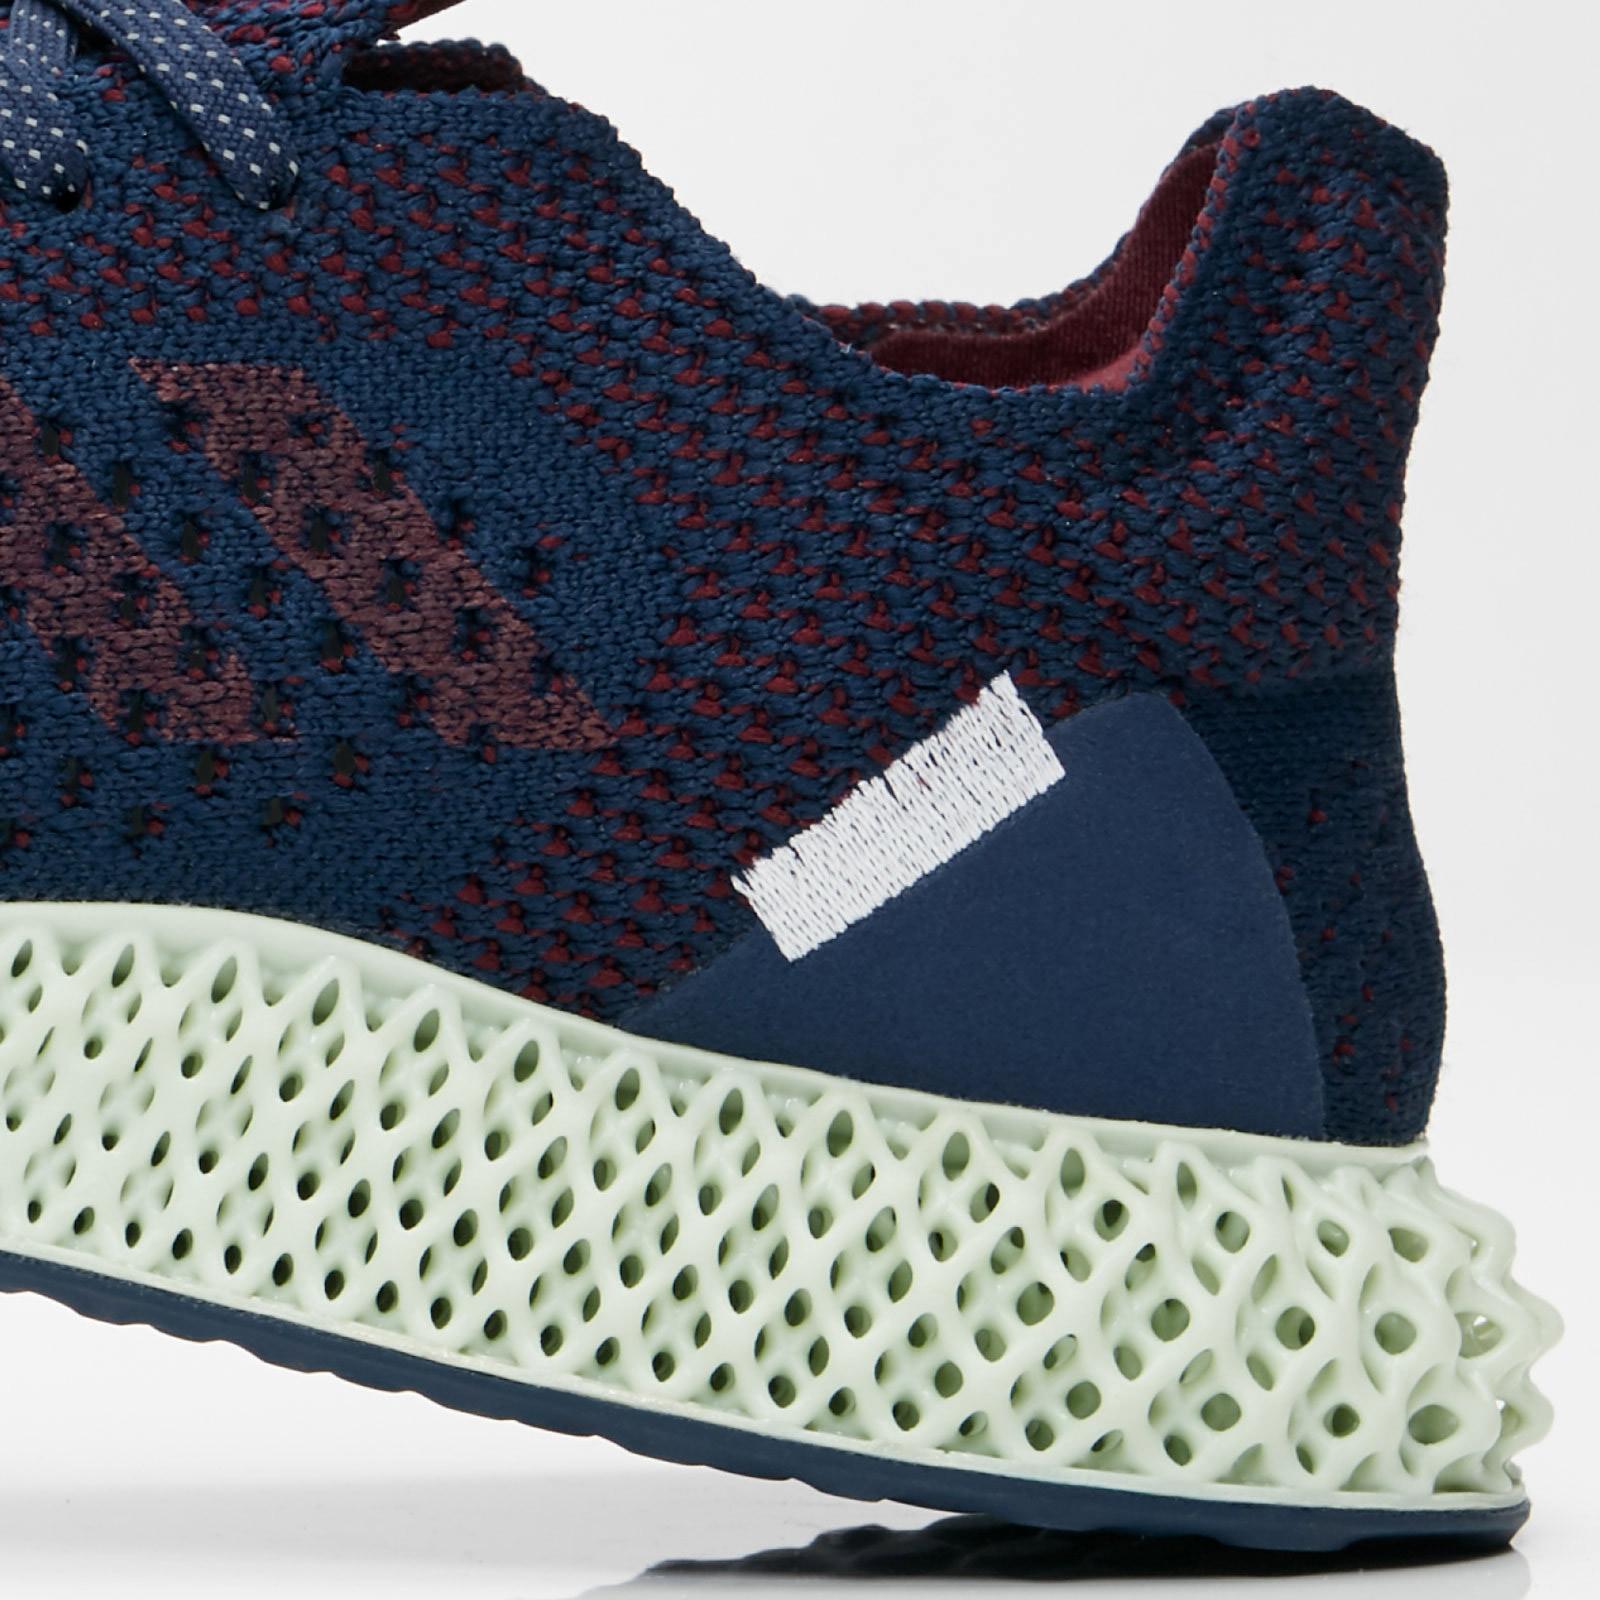 adidas 4D x Sneakersnstuff - B96533 - Sneakersnstuff  e2cca5ca9